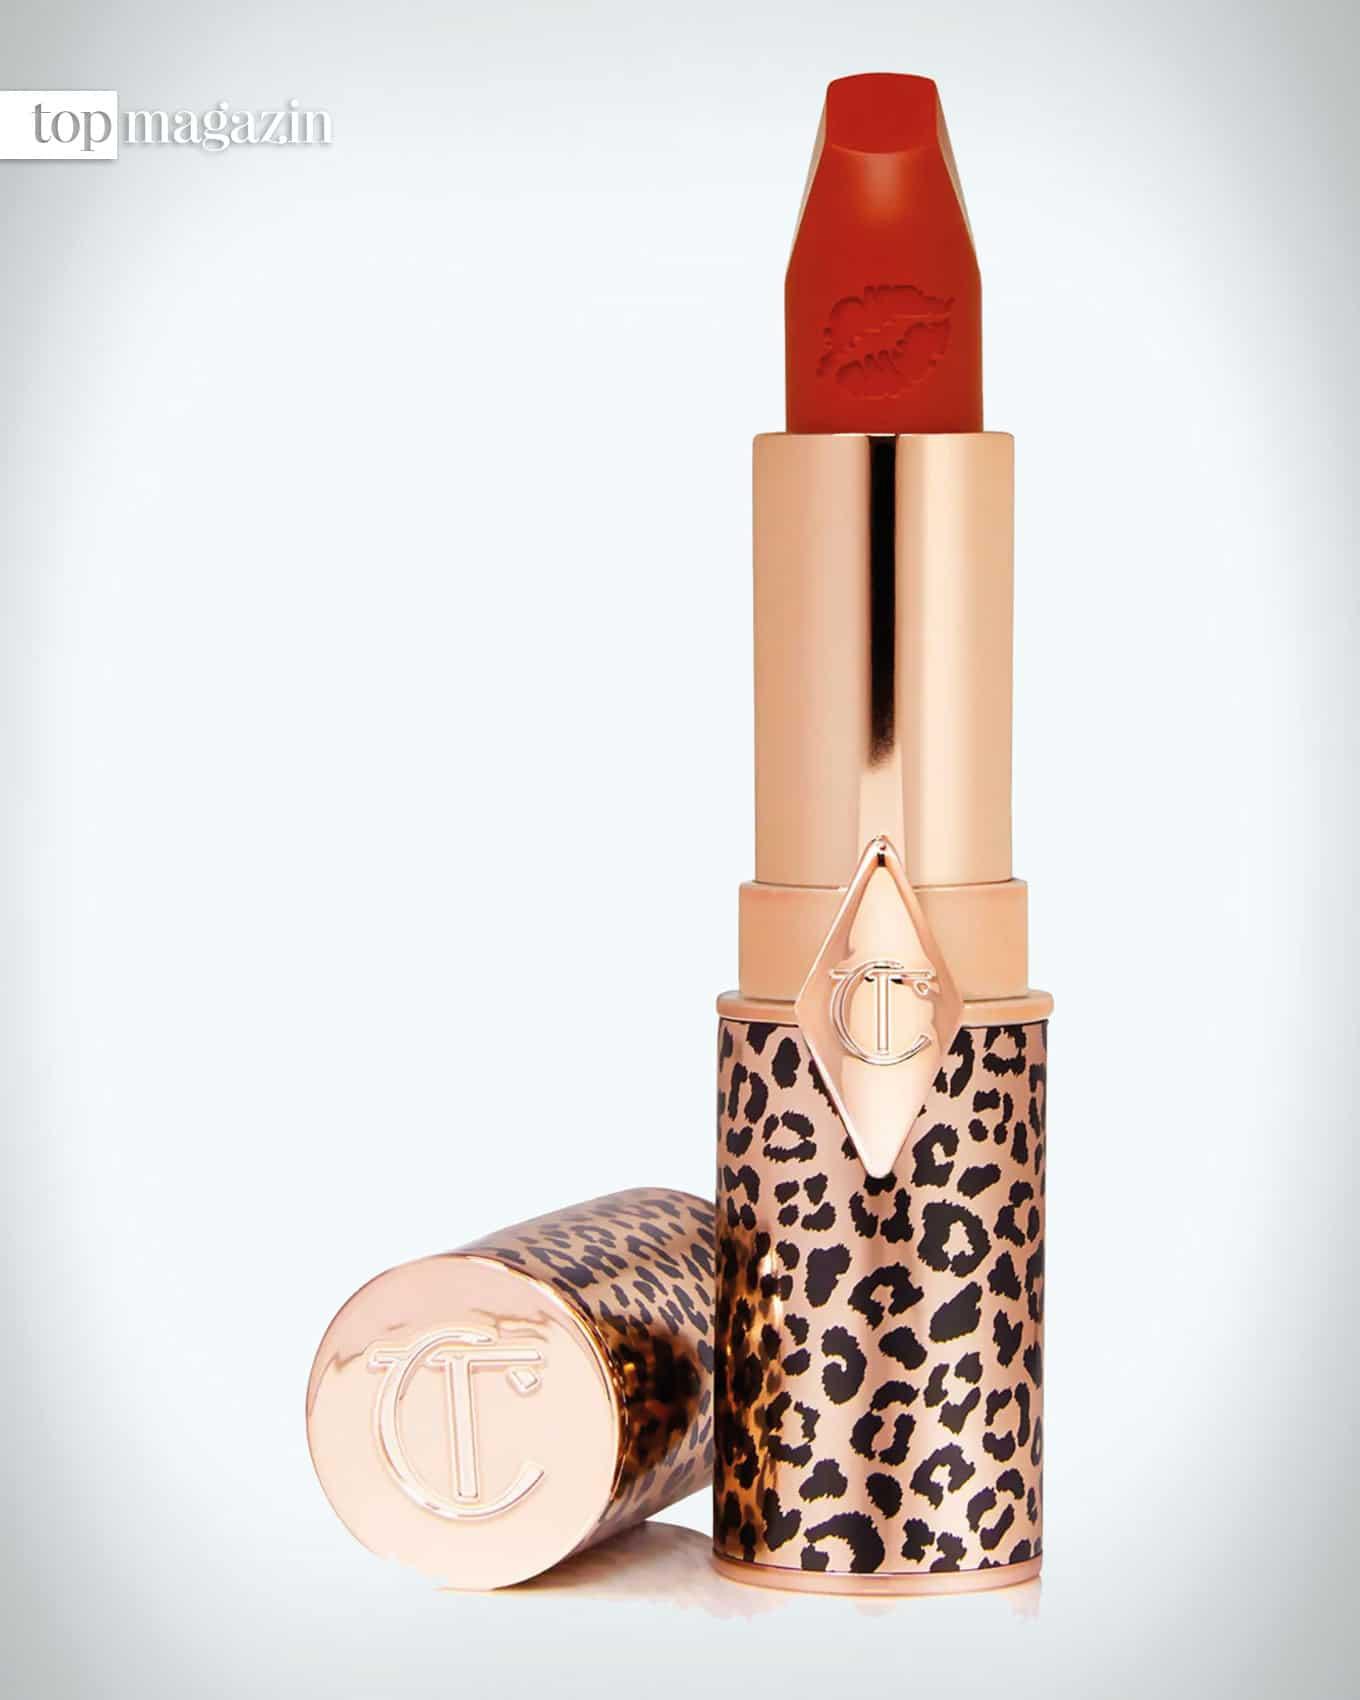 Charlotte Tilburys Hot Lips 2 Lippenstift in Red Hot Susan